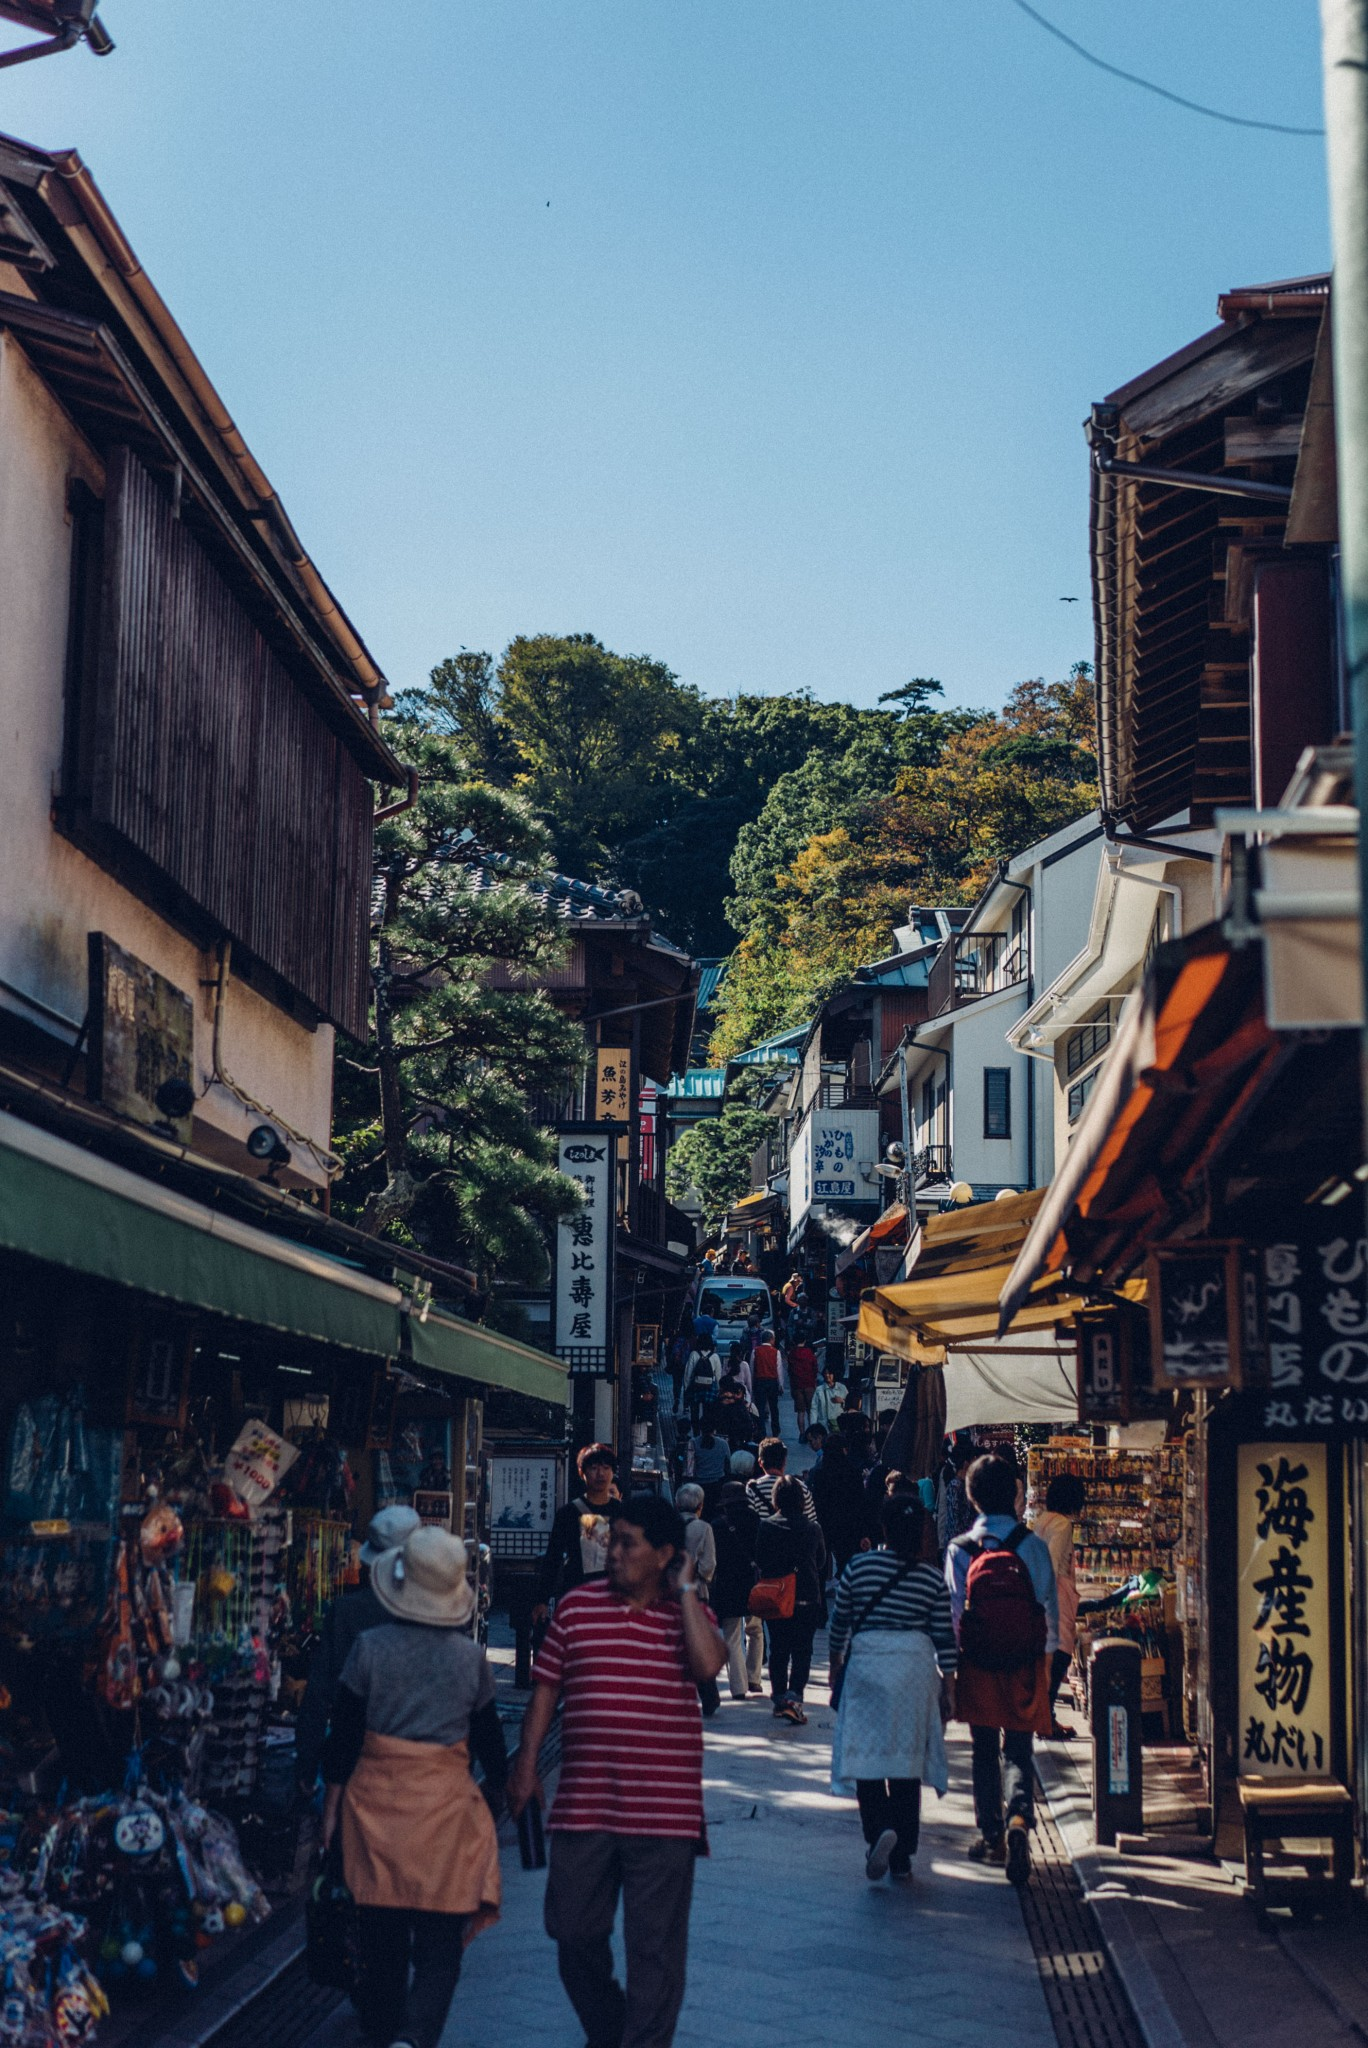 Enoshima Island: Day-trip from Tokyo